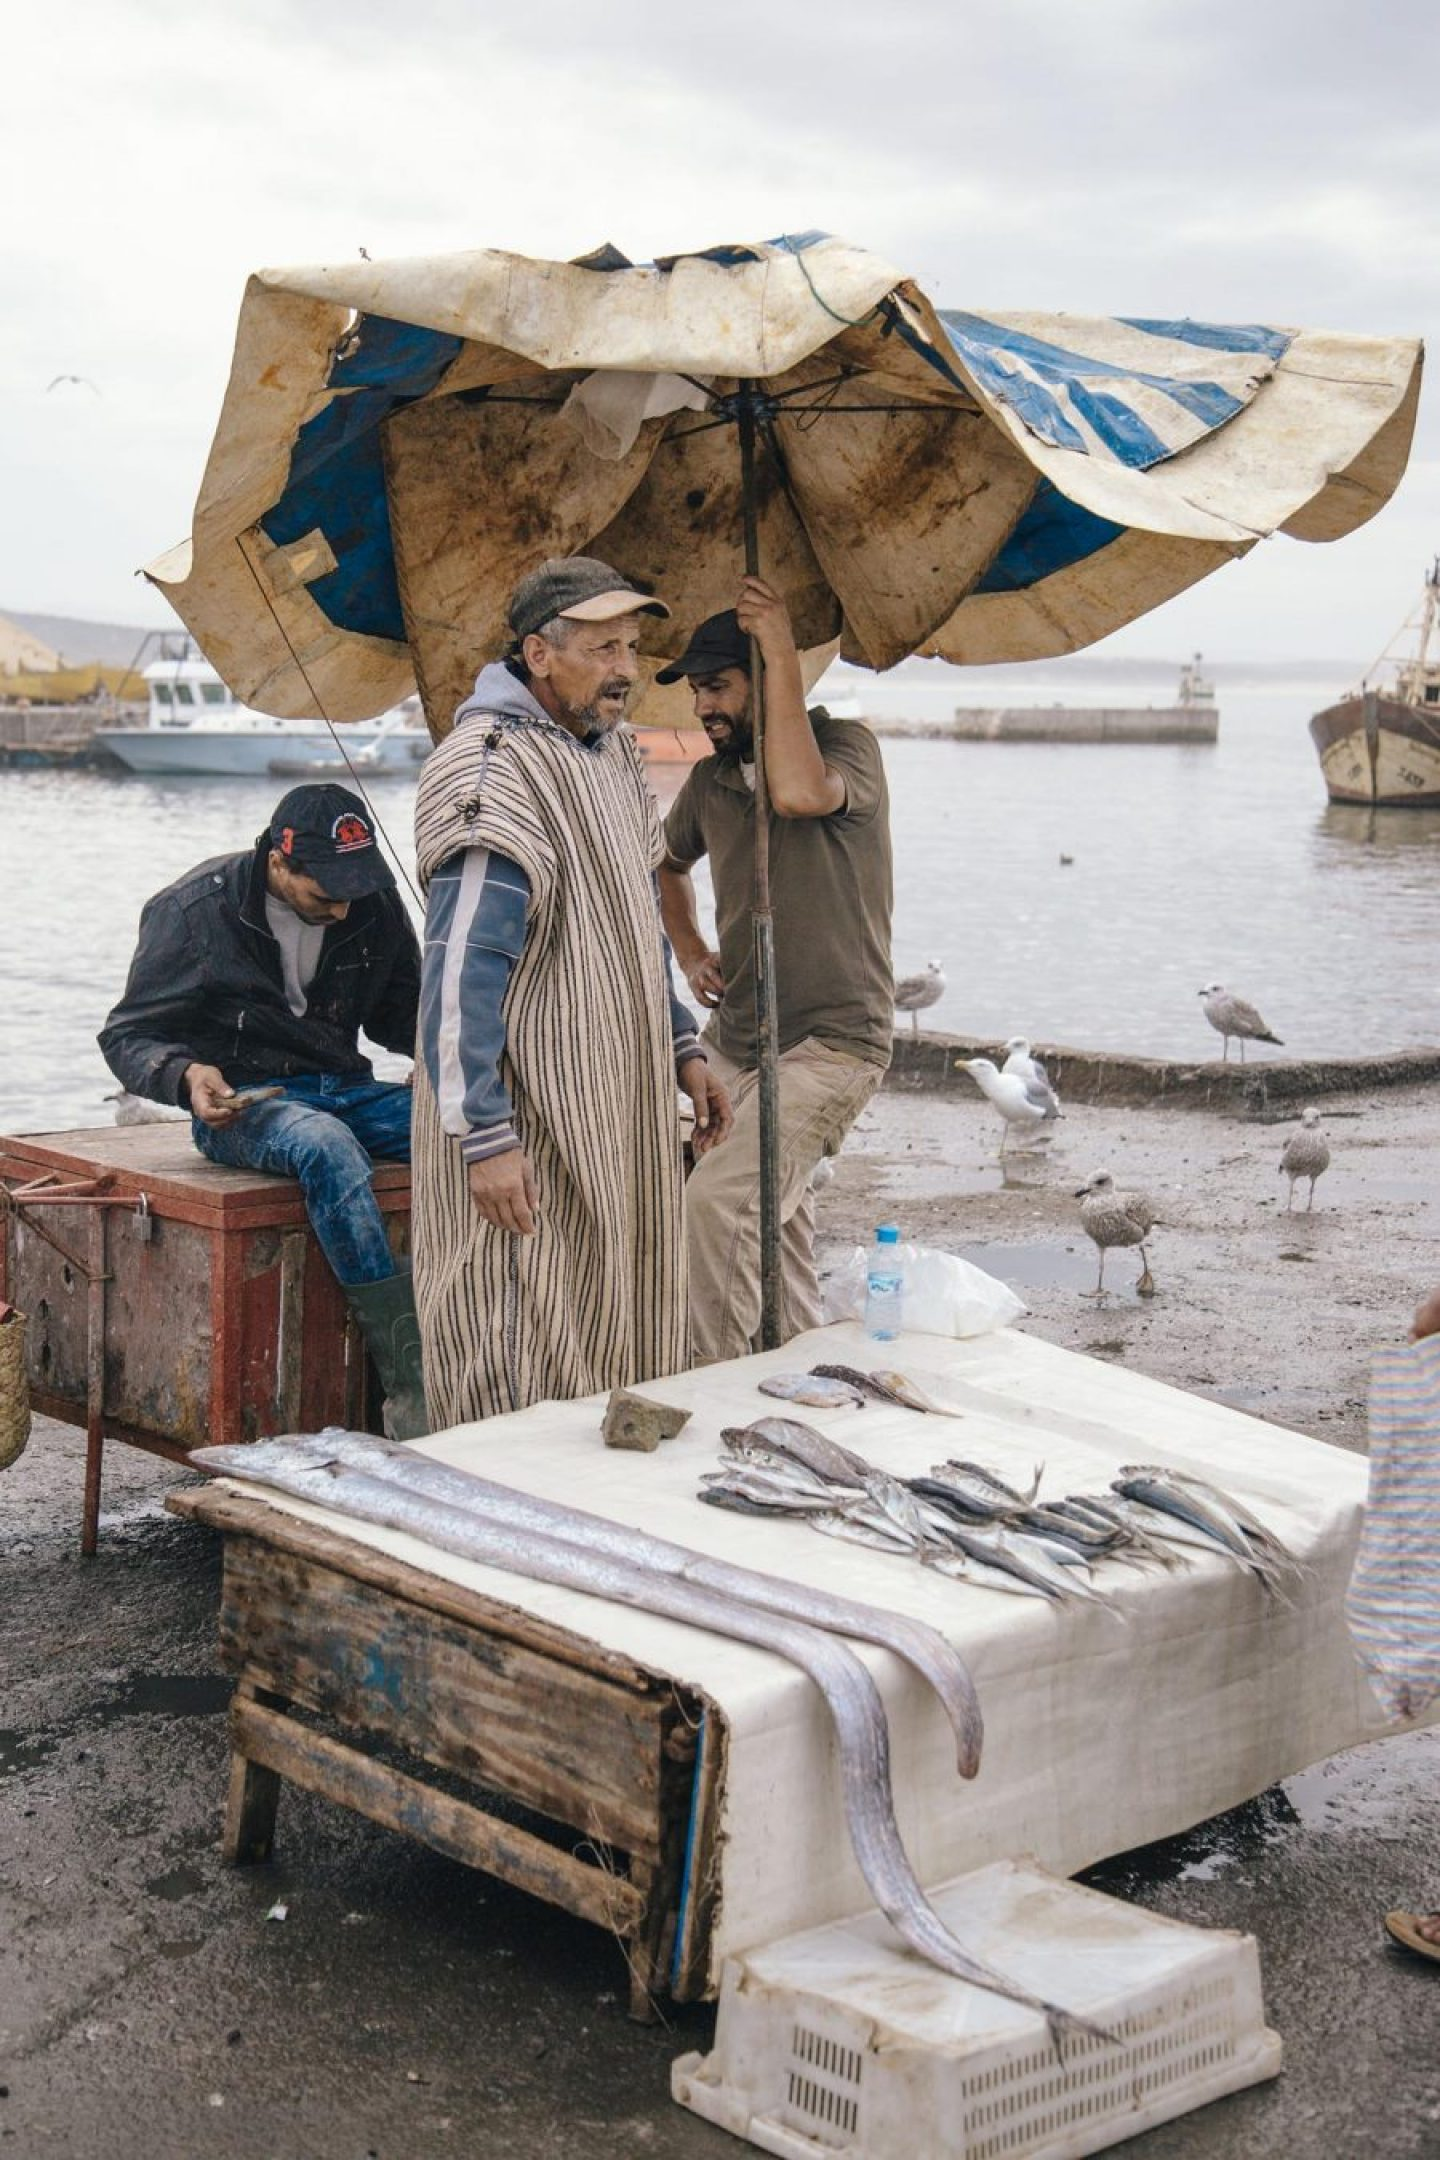 OTR_Marocco_NinaKleinrath_25